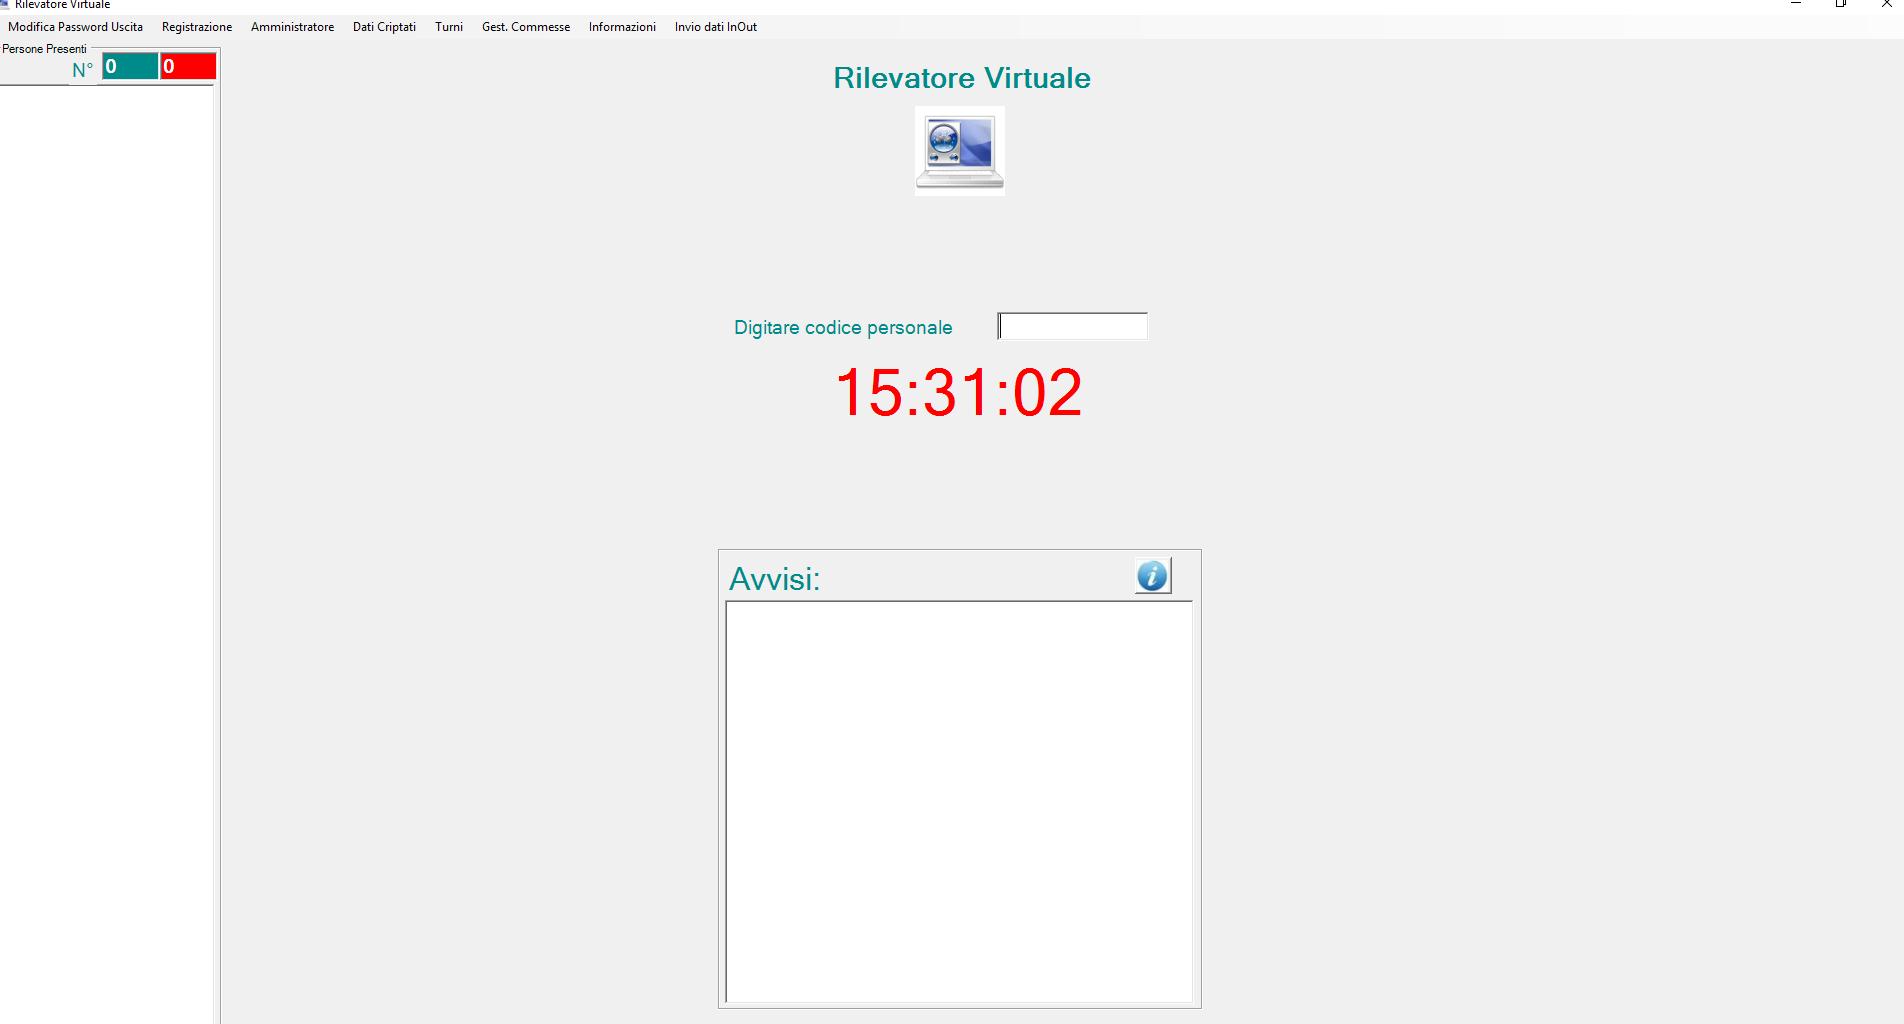 Chiave RFID - rilevatore virtuale